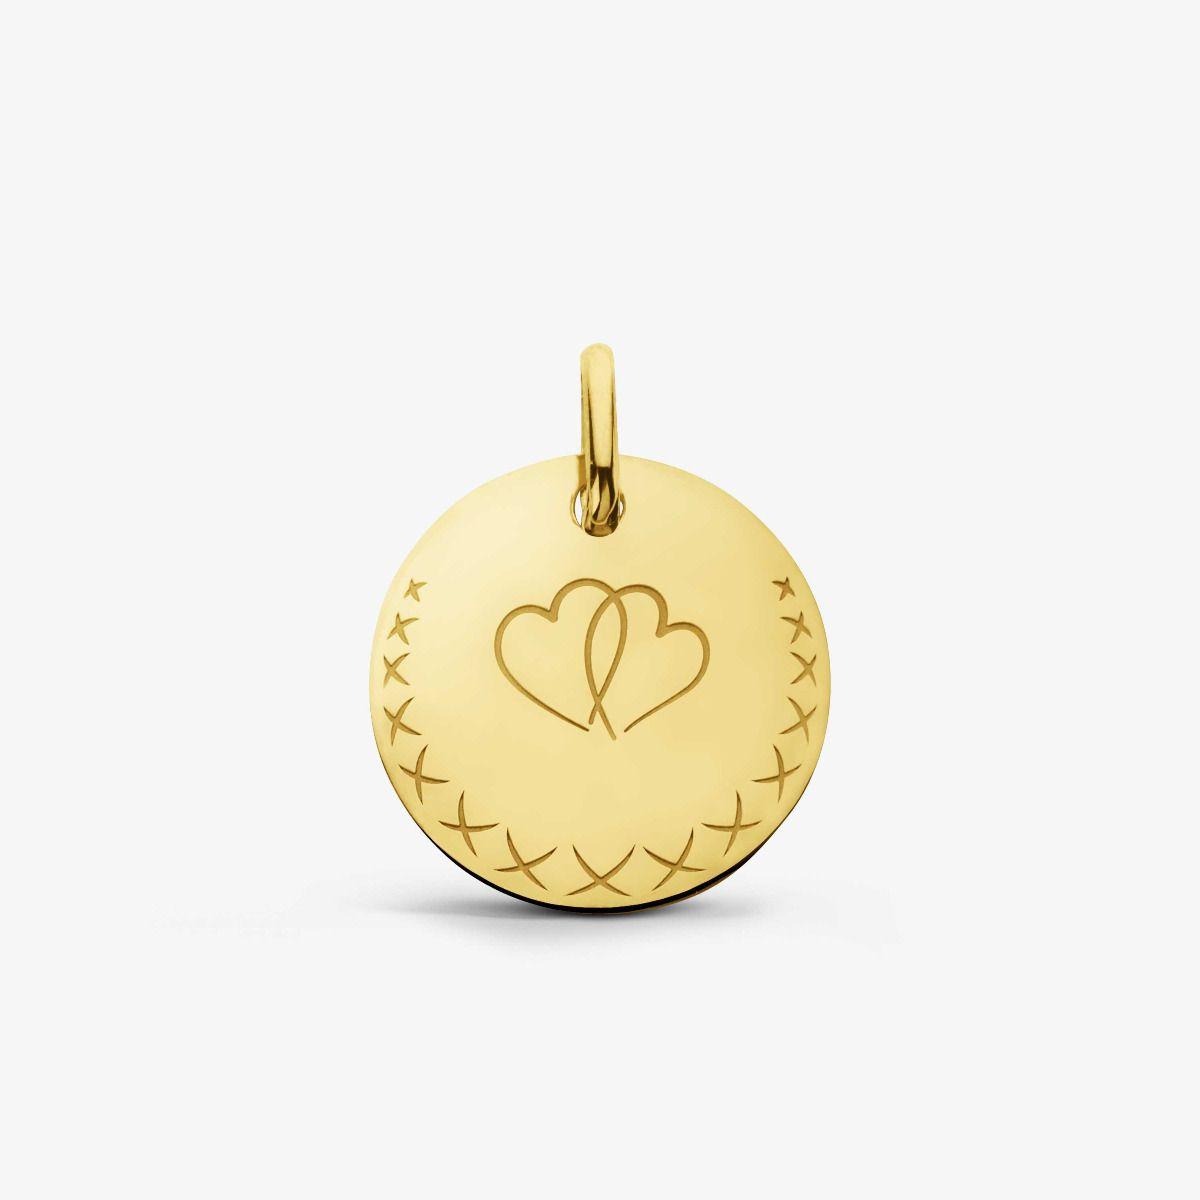 Médaille Love Bird Cœurs Or Jaune 18 carats - 16 mm